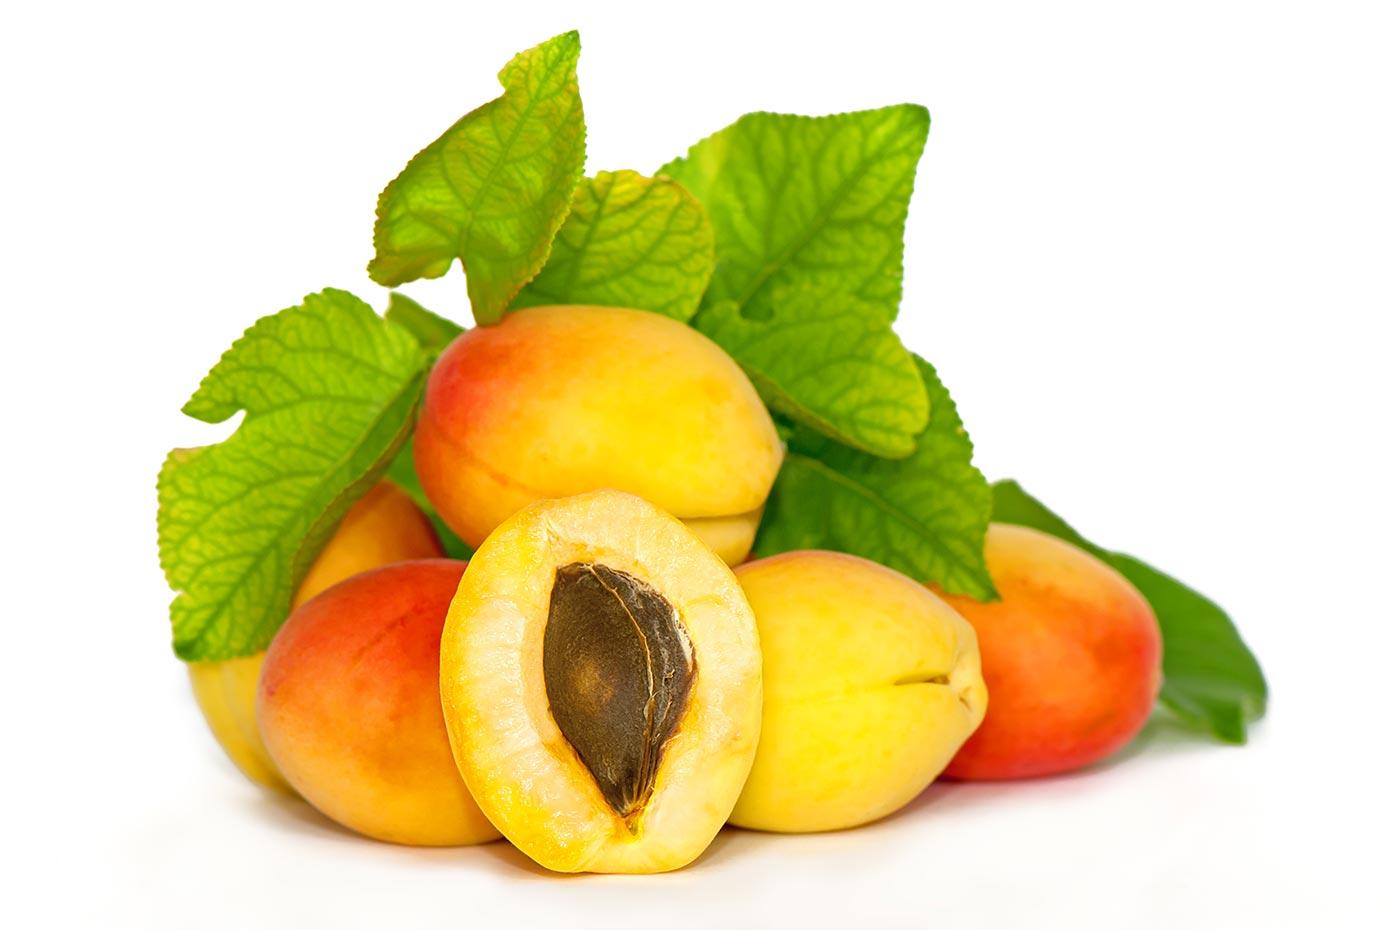 Apricot / Apricot Kernel (Xing, Xing Ren)